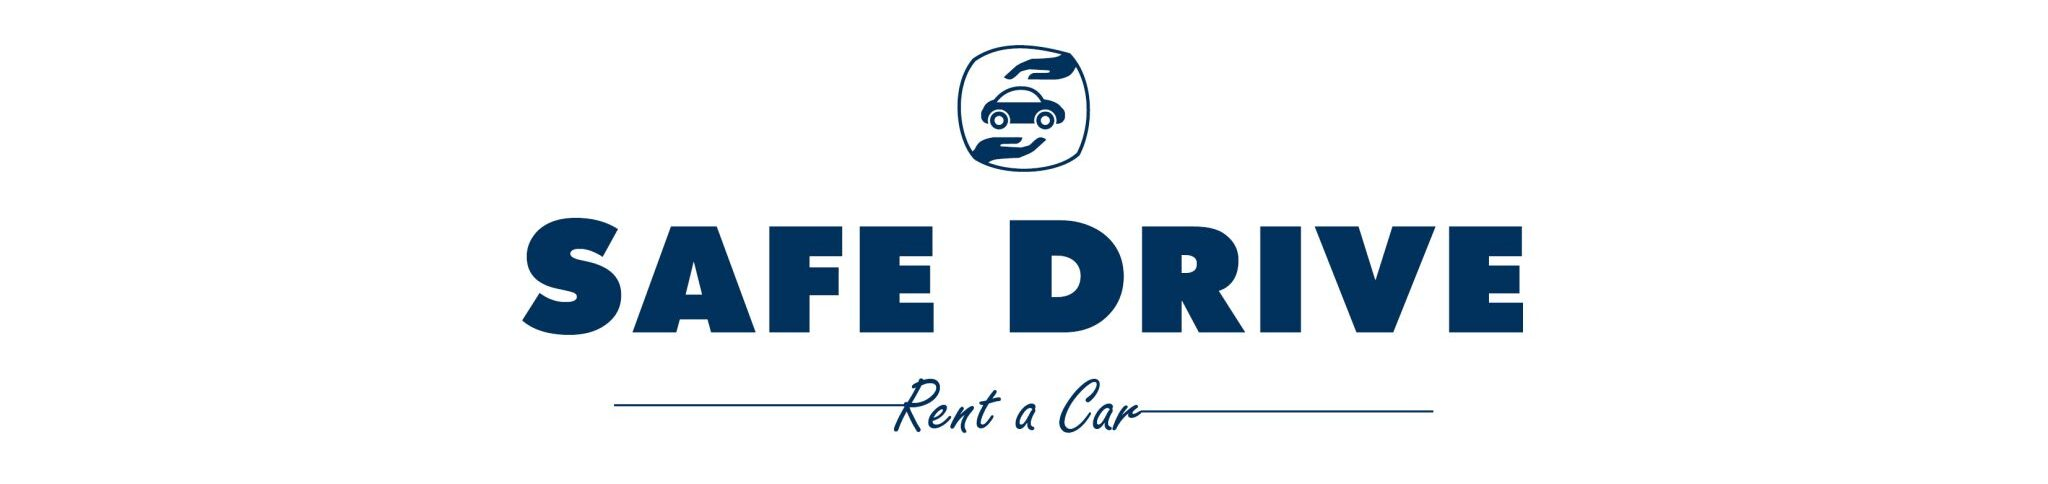 Car rental Chania Crete – Ενοικιασεις αυτοκινητων στα Χανια Κρητης